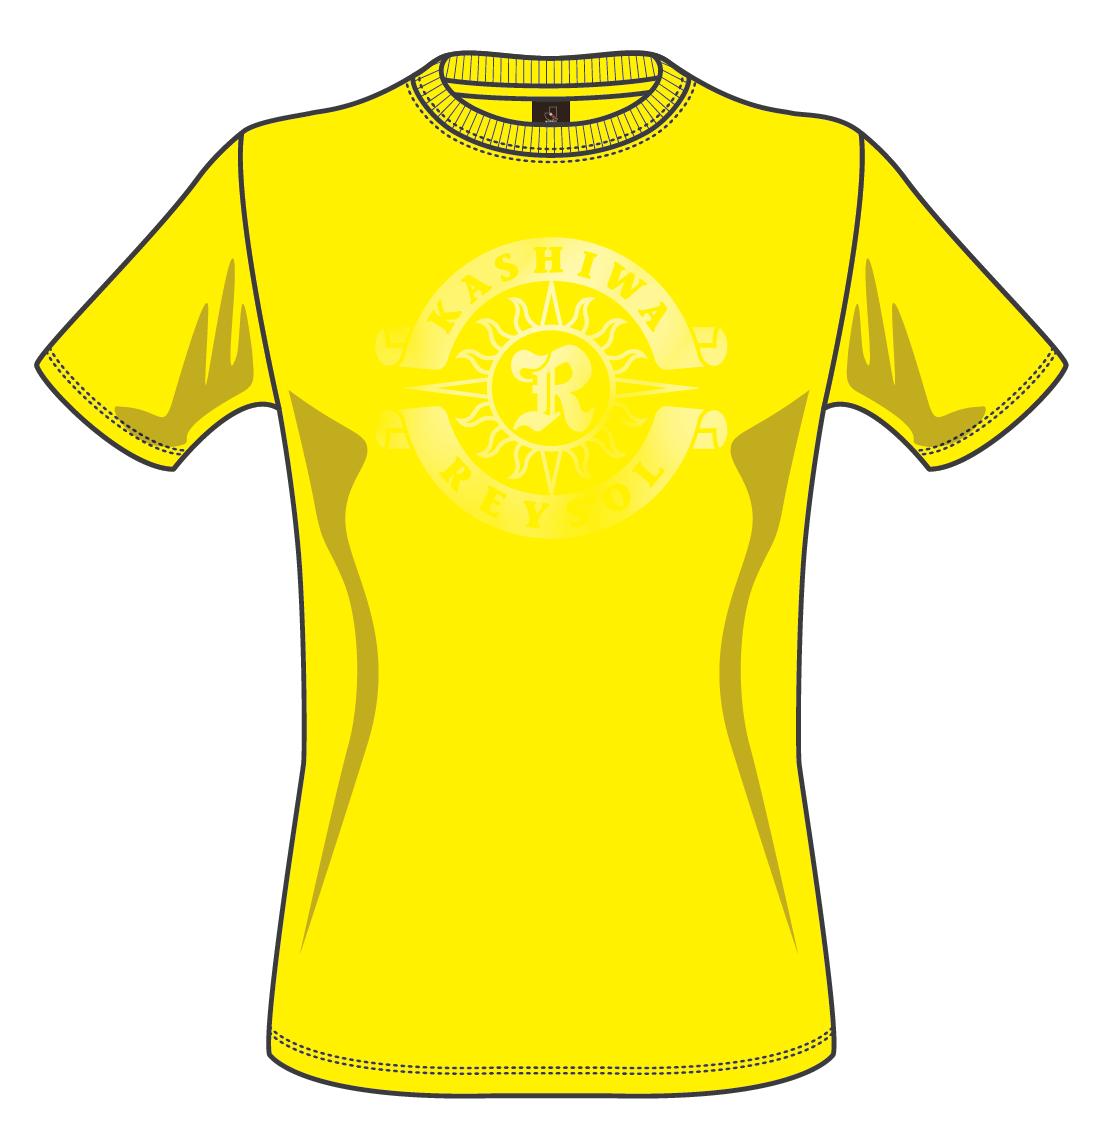 190601_shirts.png